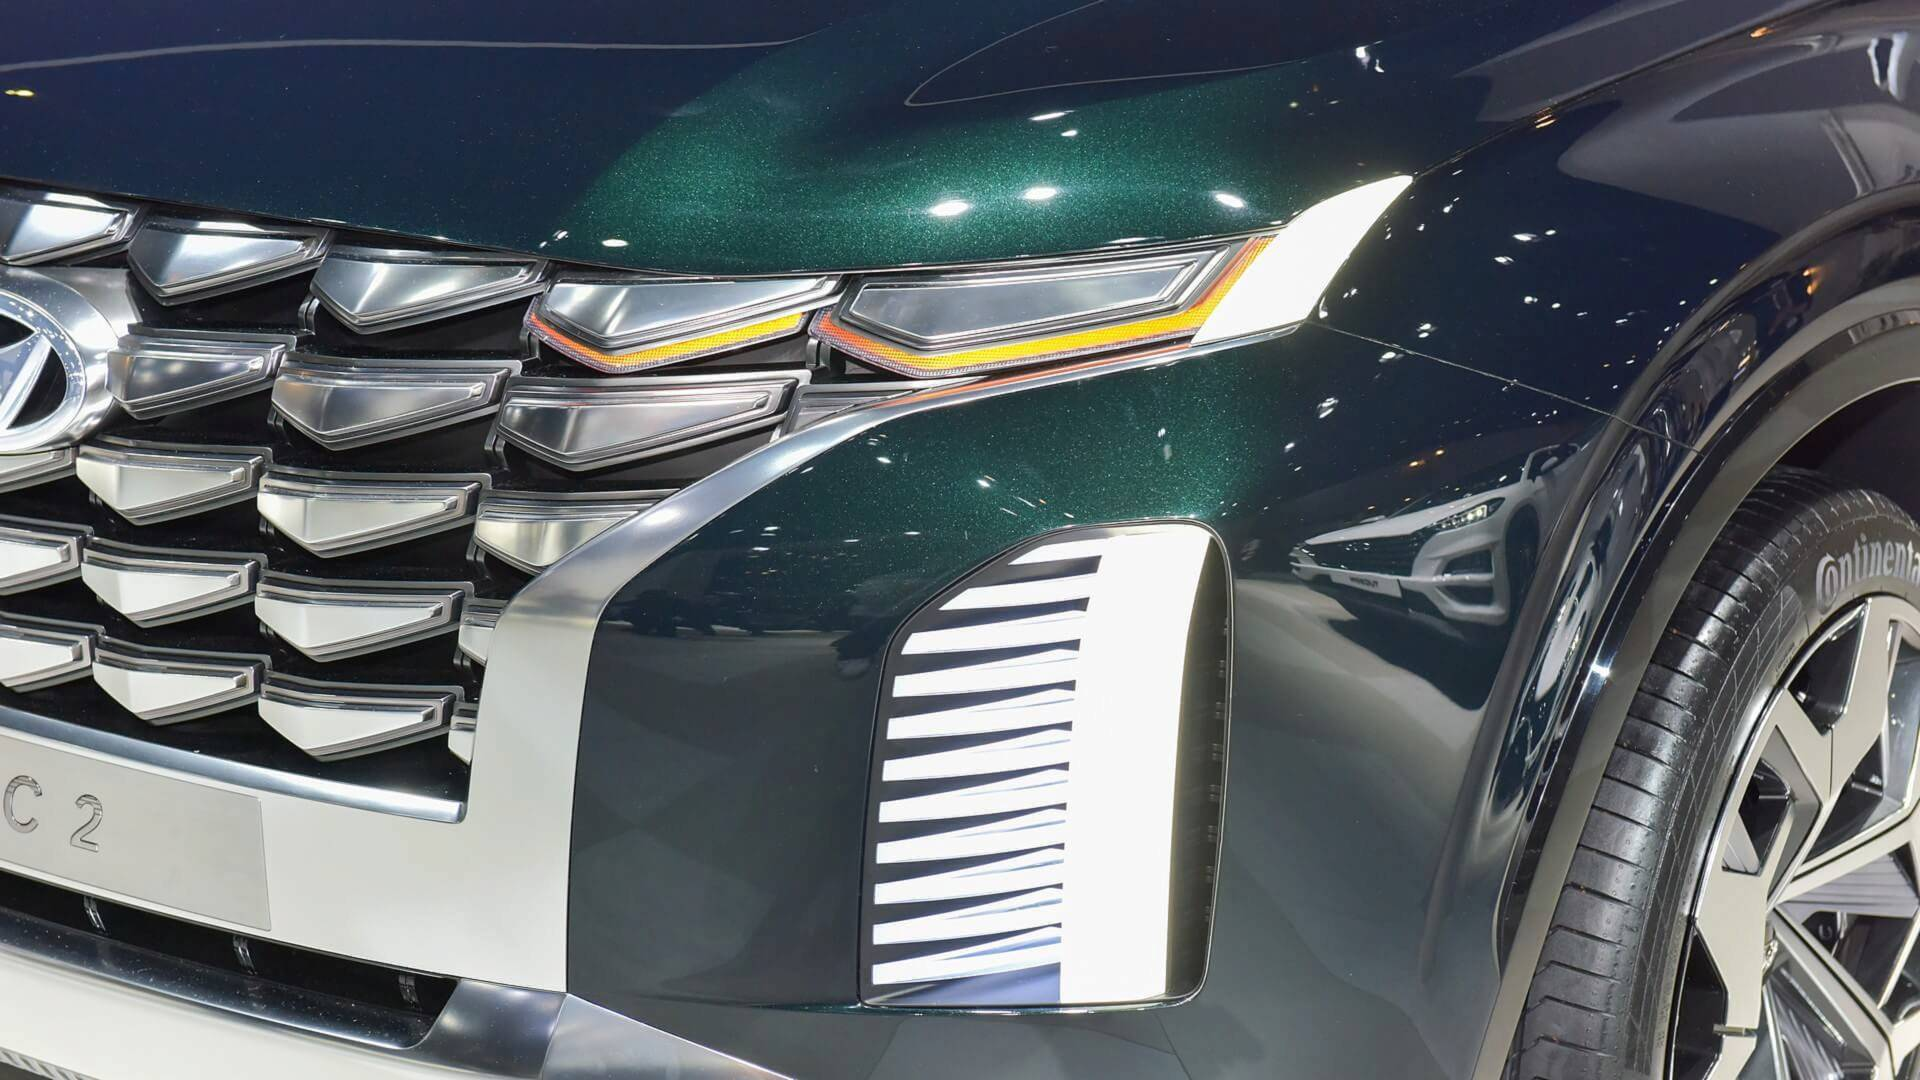 hyundai-hdc-2-grandmaster-concept-4 SUV-ul Hyundai se zvoneste a fi un concurent pentru Toyota Land Cruiser